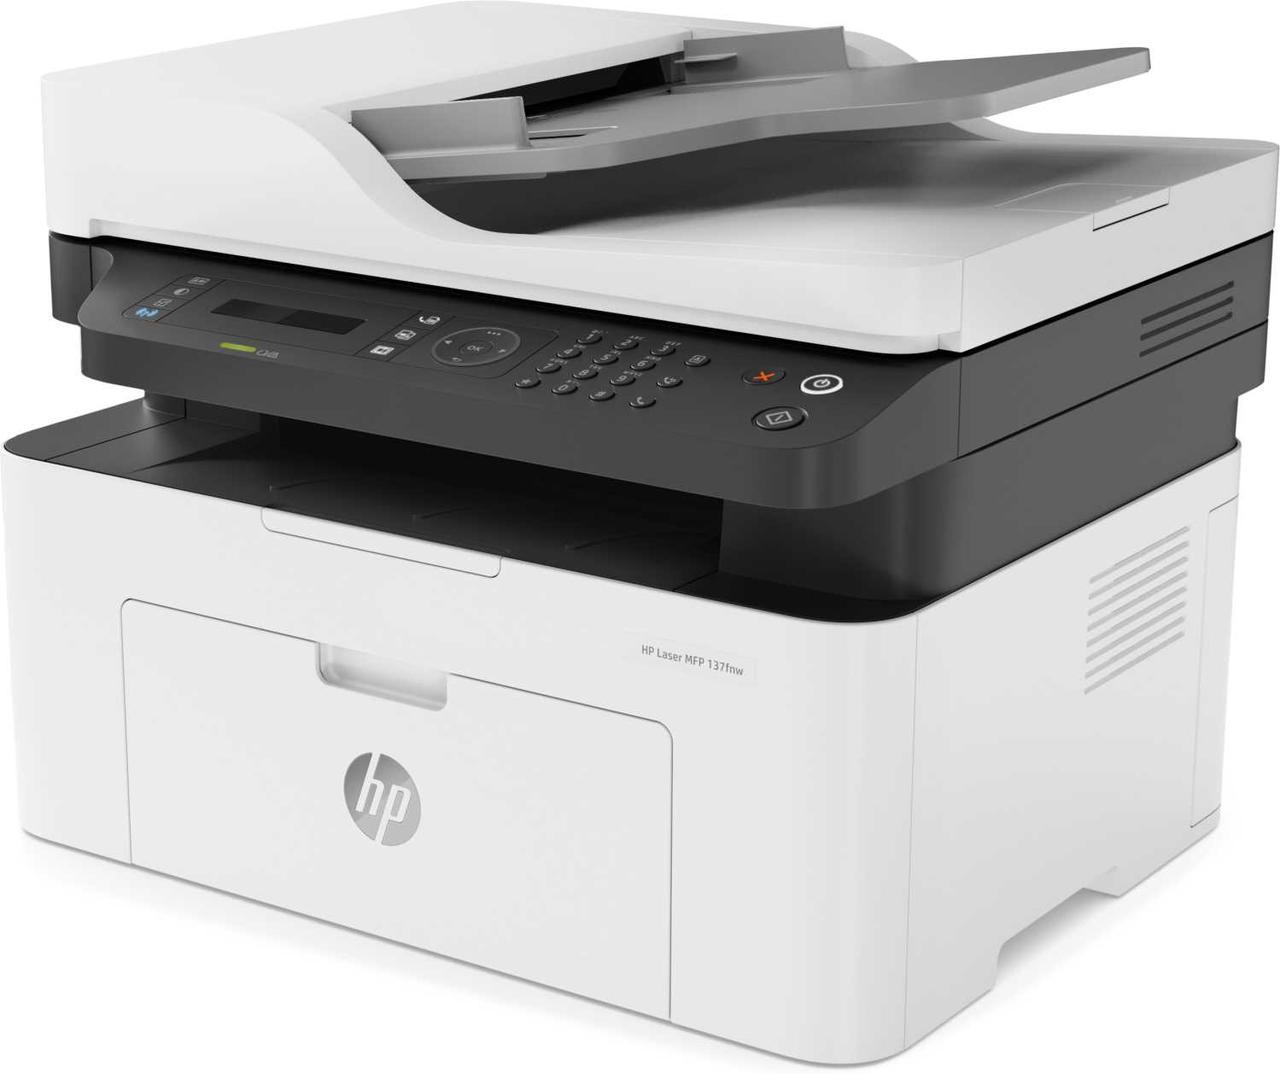 Мфу HP 4ZB84A HP Laser MFP 137fnw Printer (A4) , Printer/Scanner/Copier/Fax, 1200 dpi, 20 ppm, 128 MB, 600